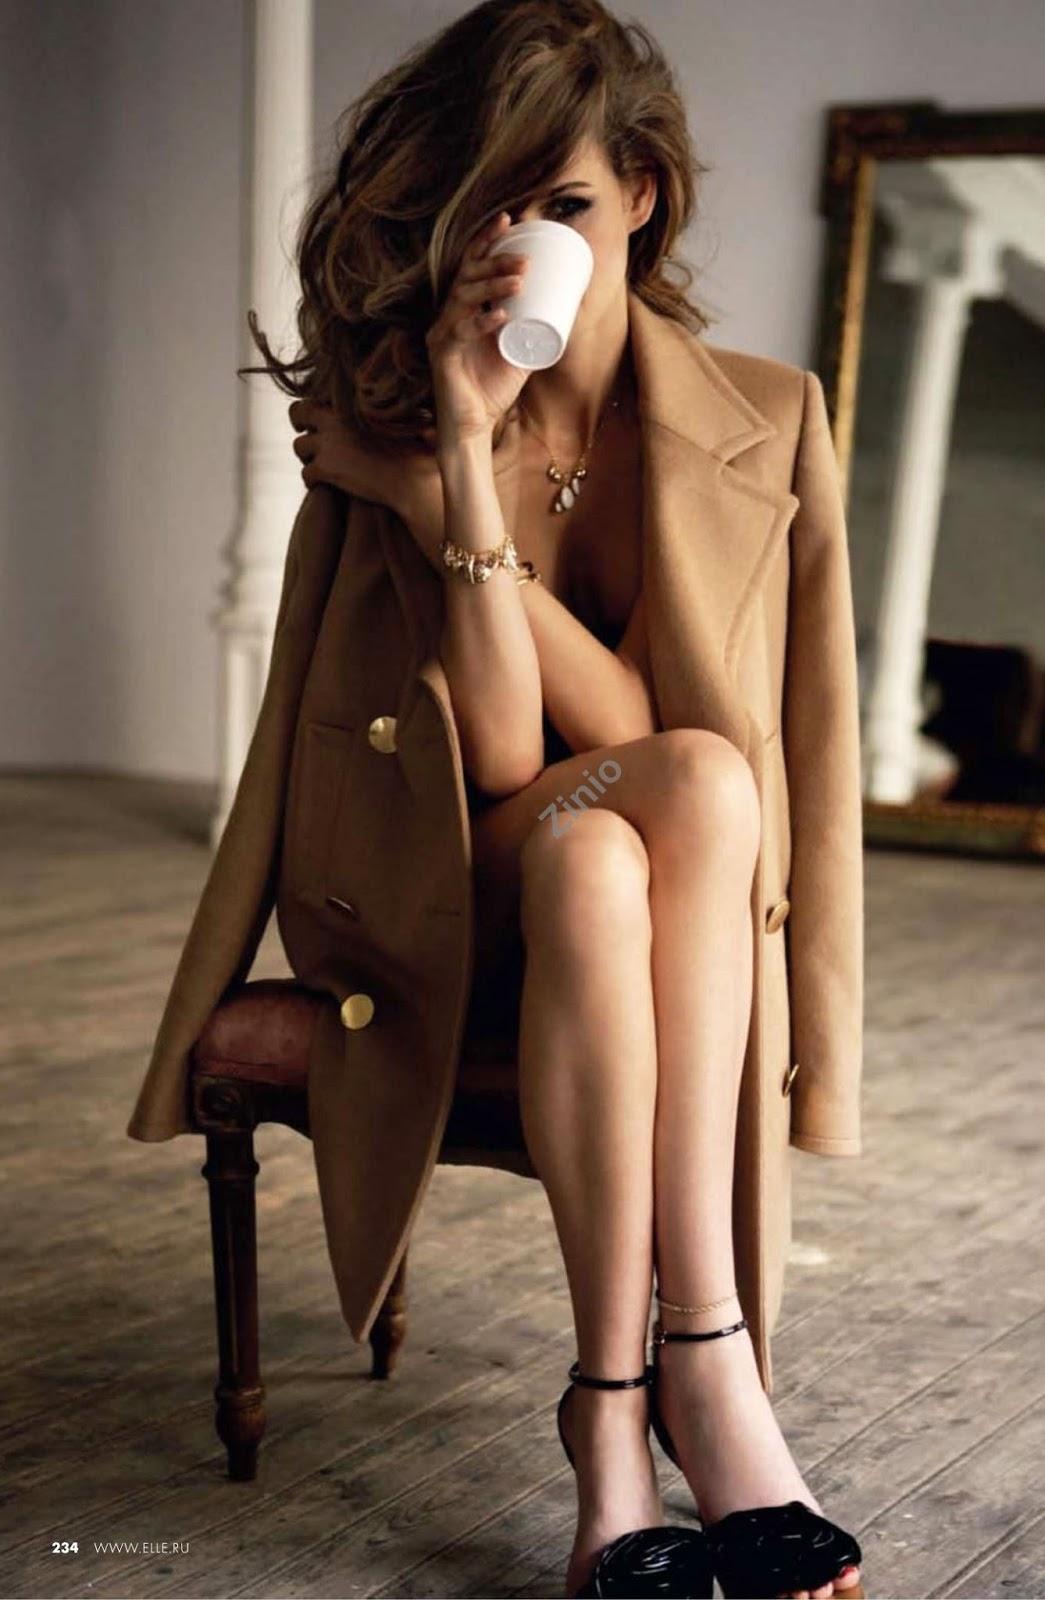 Flavia de Oliveira in Elle Russia November 2009 (photography: Mario Sierra, styling:  Immaculada Jimenez)